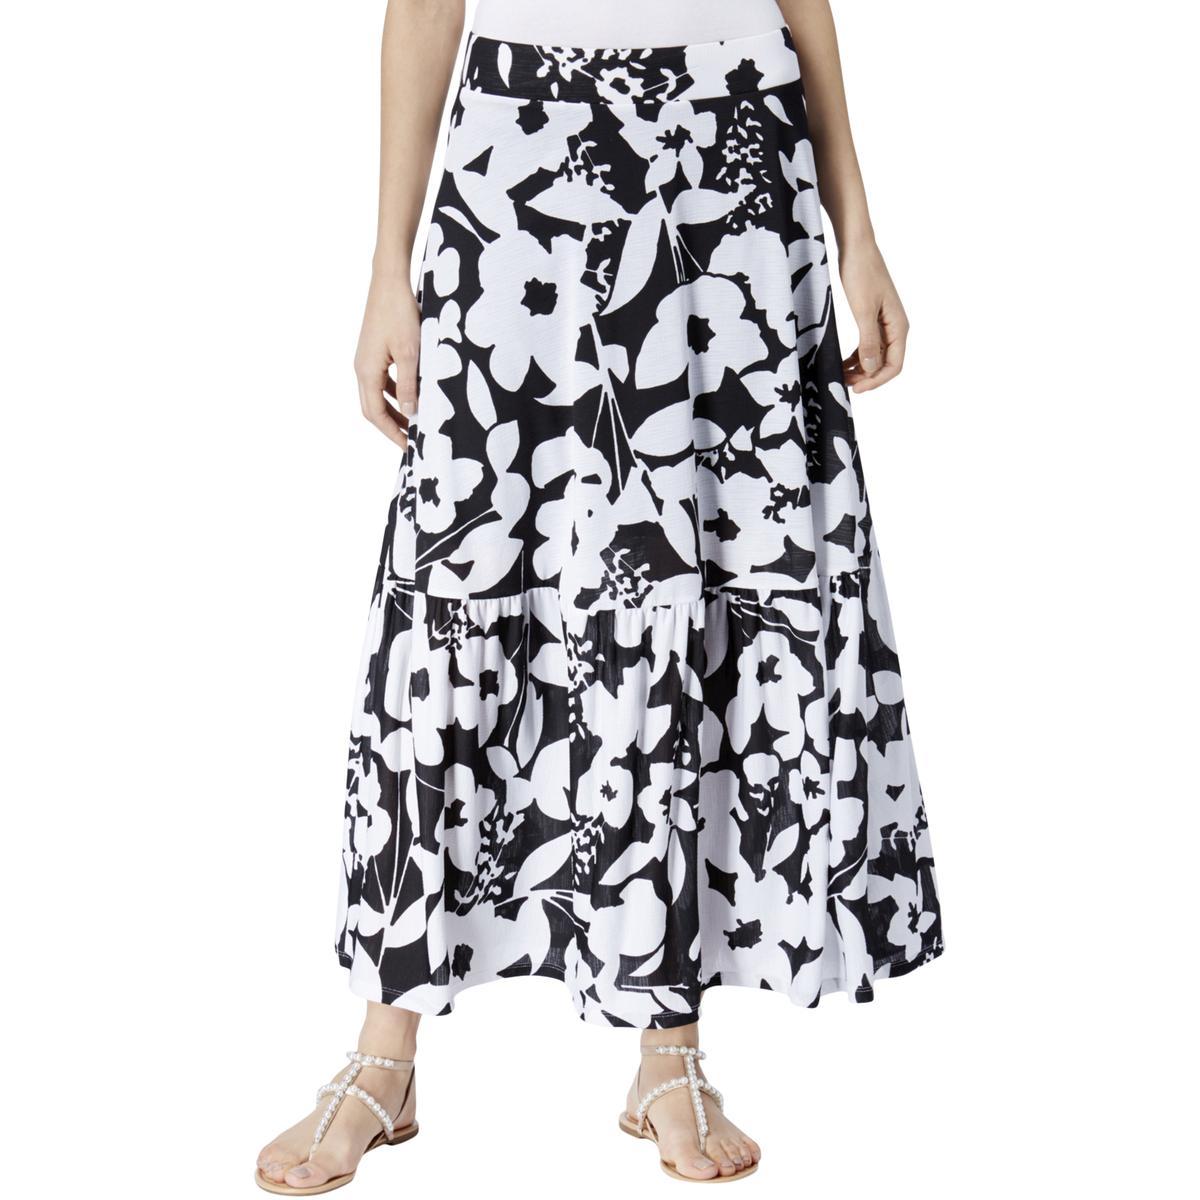 9f19bb24d9 INC Womens B/W Floral Print Pull On Long Maxi Skirt M BHFO 0031 ...